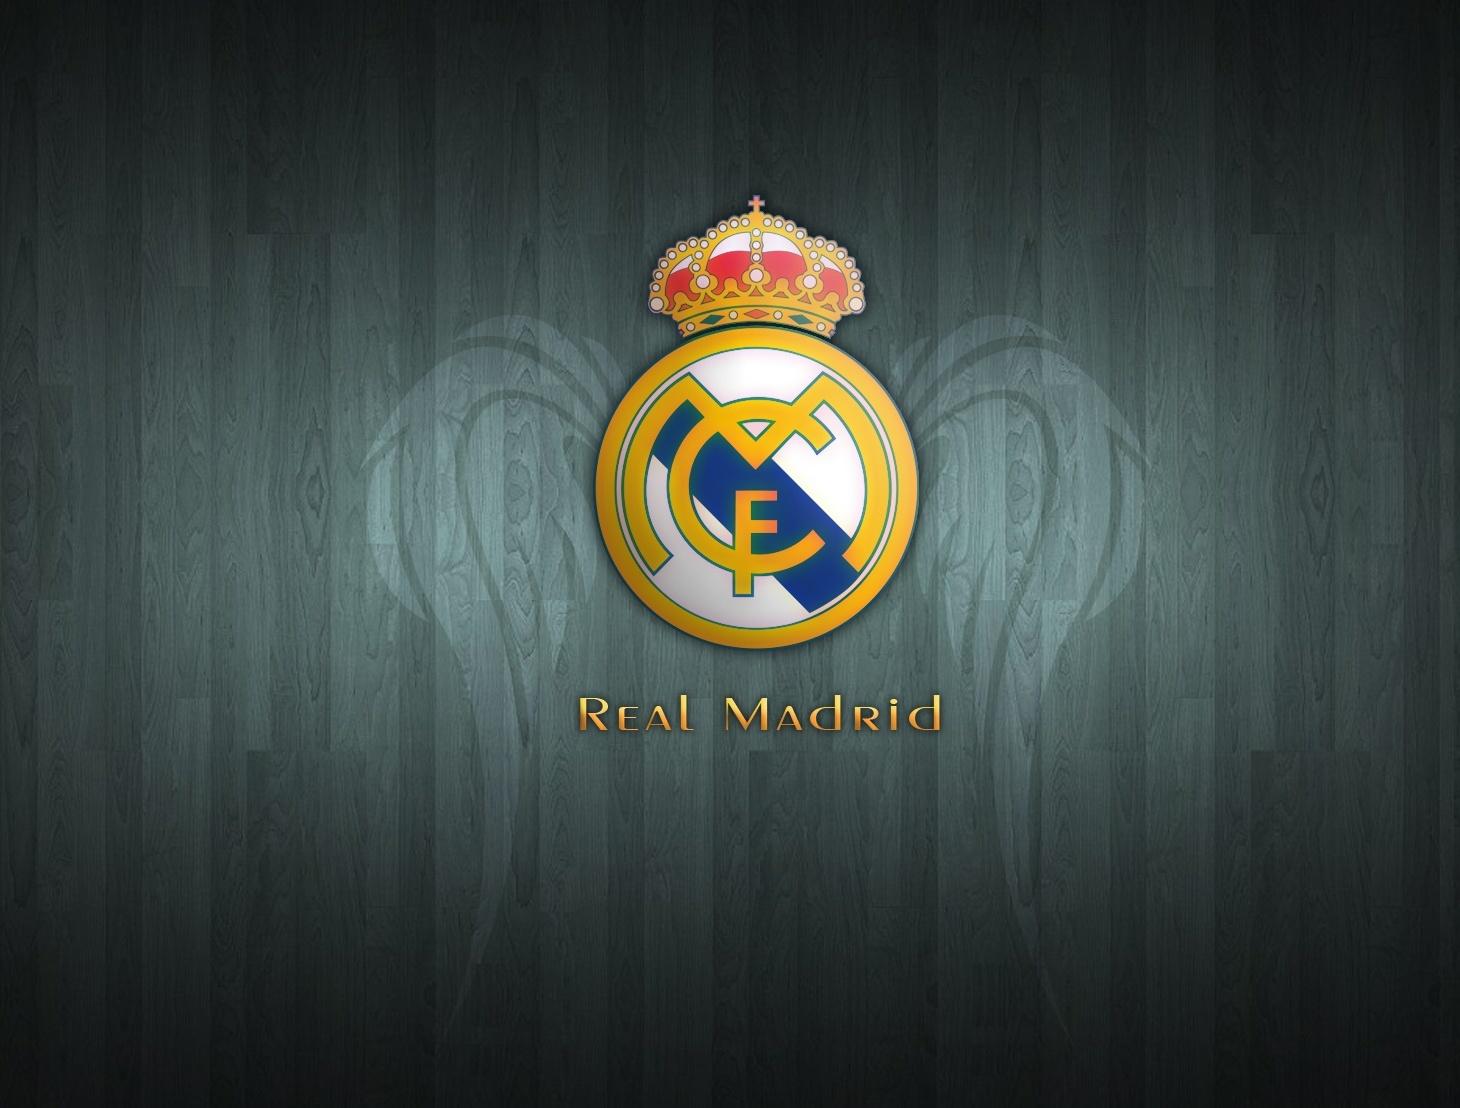 http://3.bp.blogspot.com/-lmK0_hT7IqI/TeKiMDNLFvI/AAAAAAAAAuw/uOOJjB_j2O0/s1600/real_madrid_logo_wallpaper.jpg